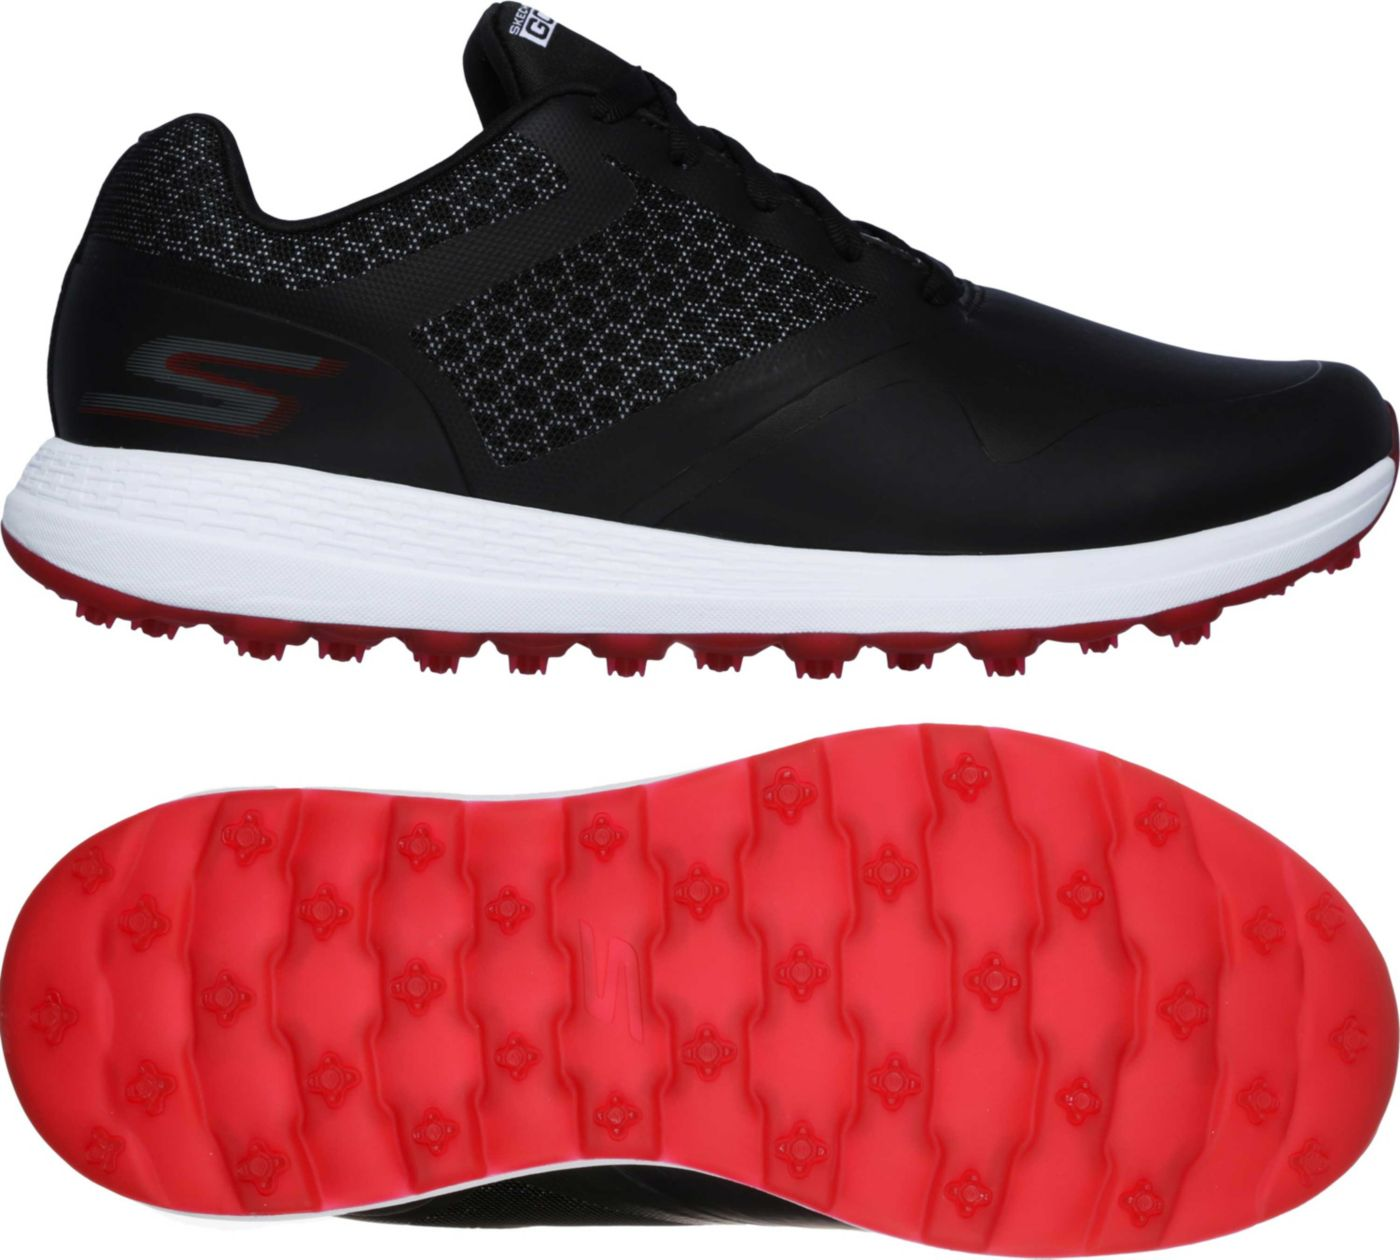 Skechers Men's GO GOLF Max Golf Shoes